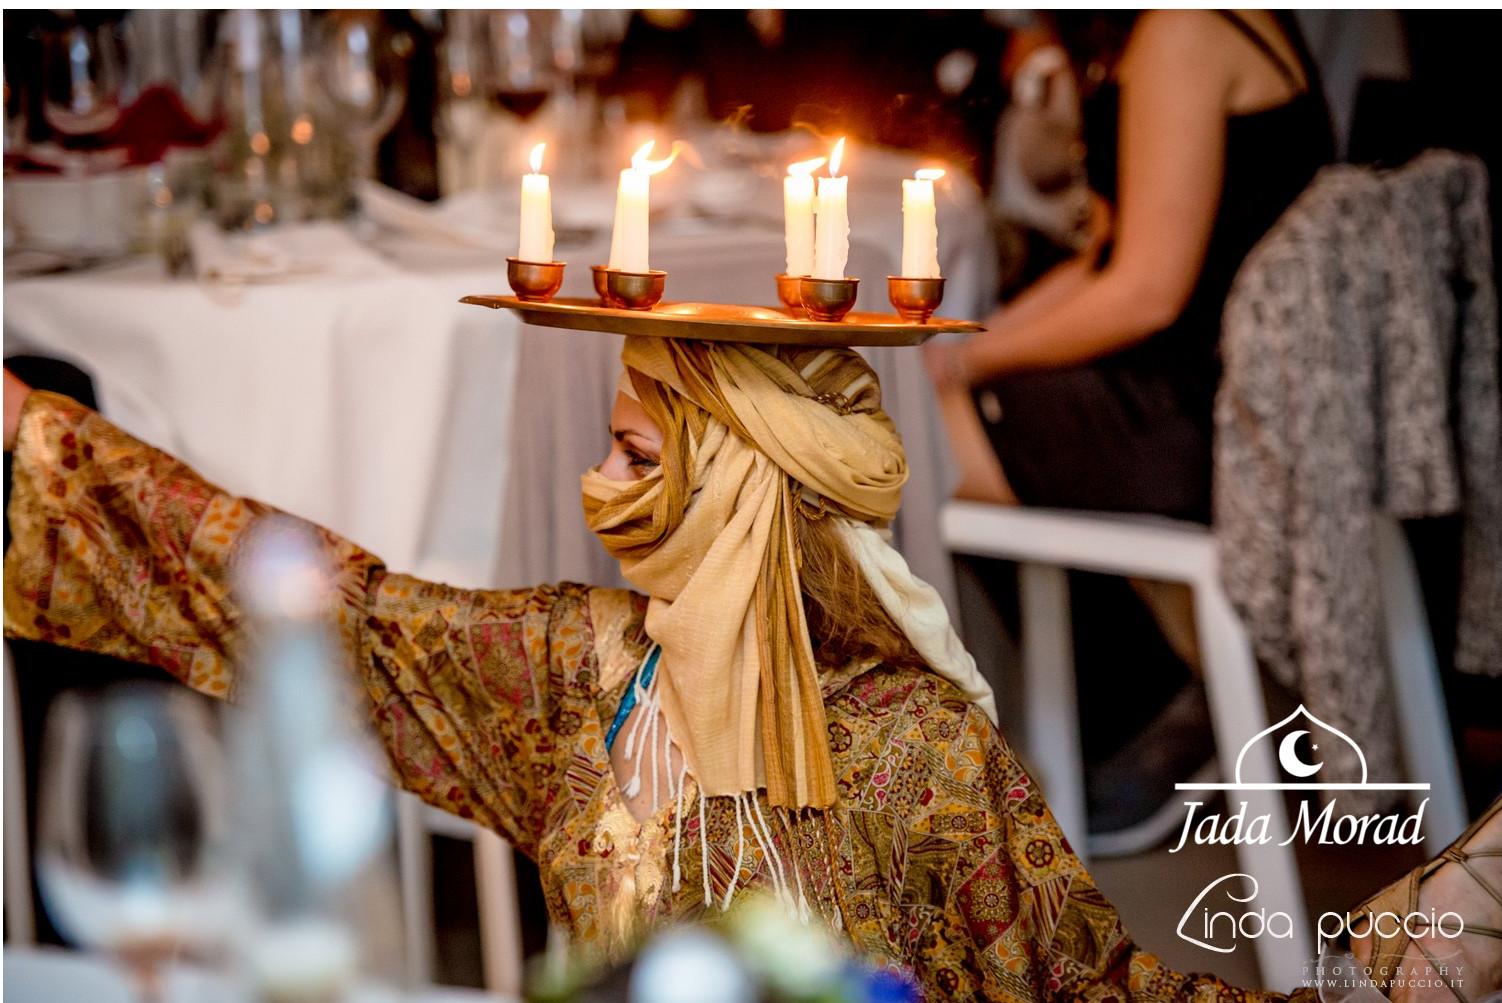 Jada Morad wedding.jpg